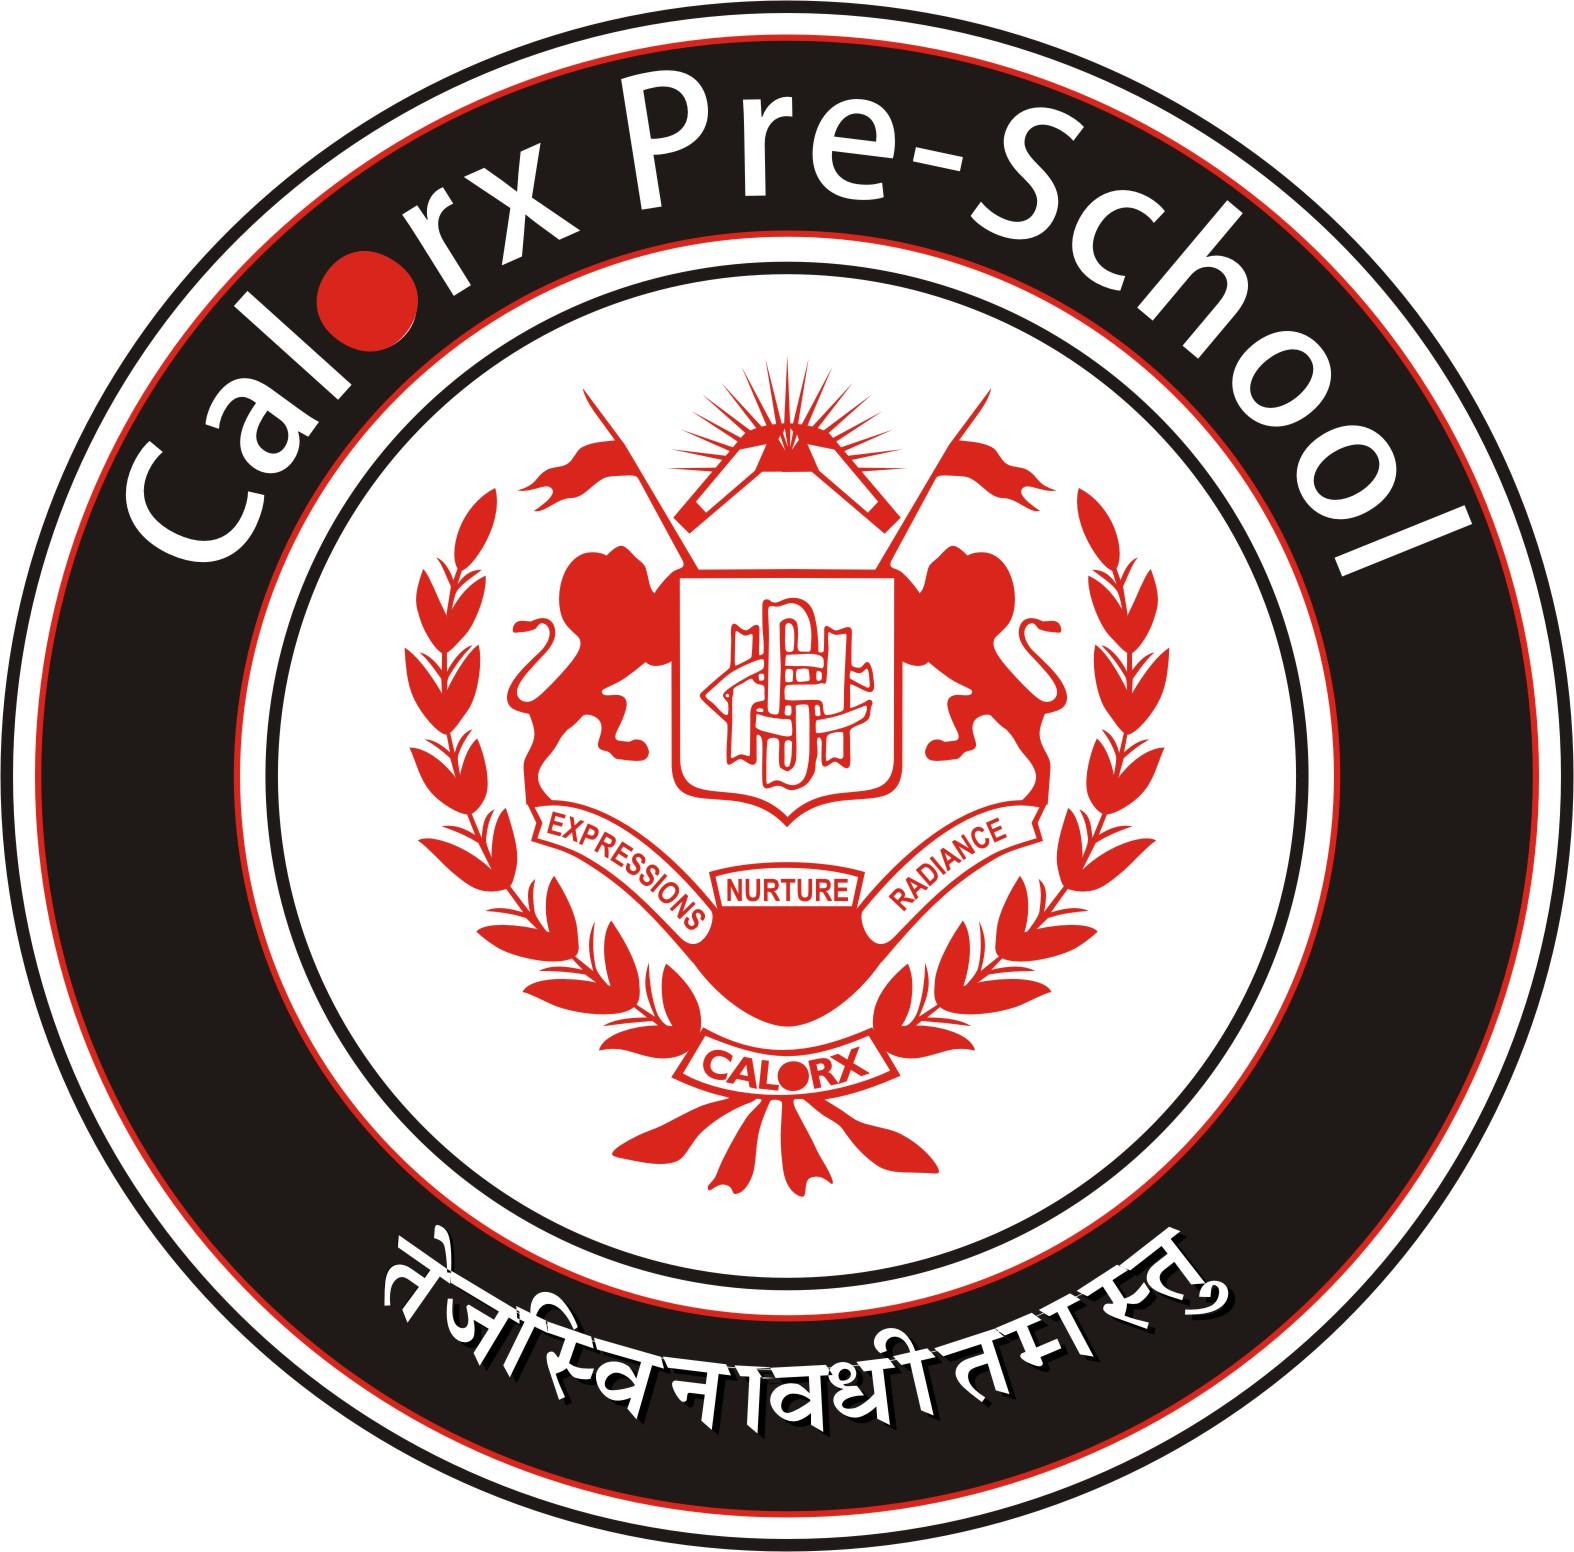 Calorx Preschool chain